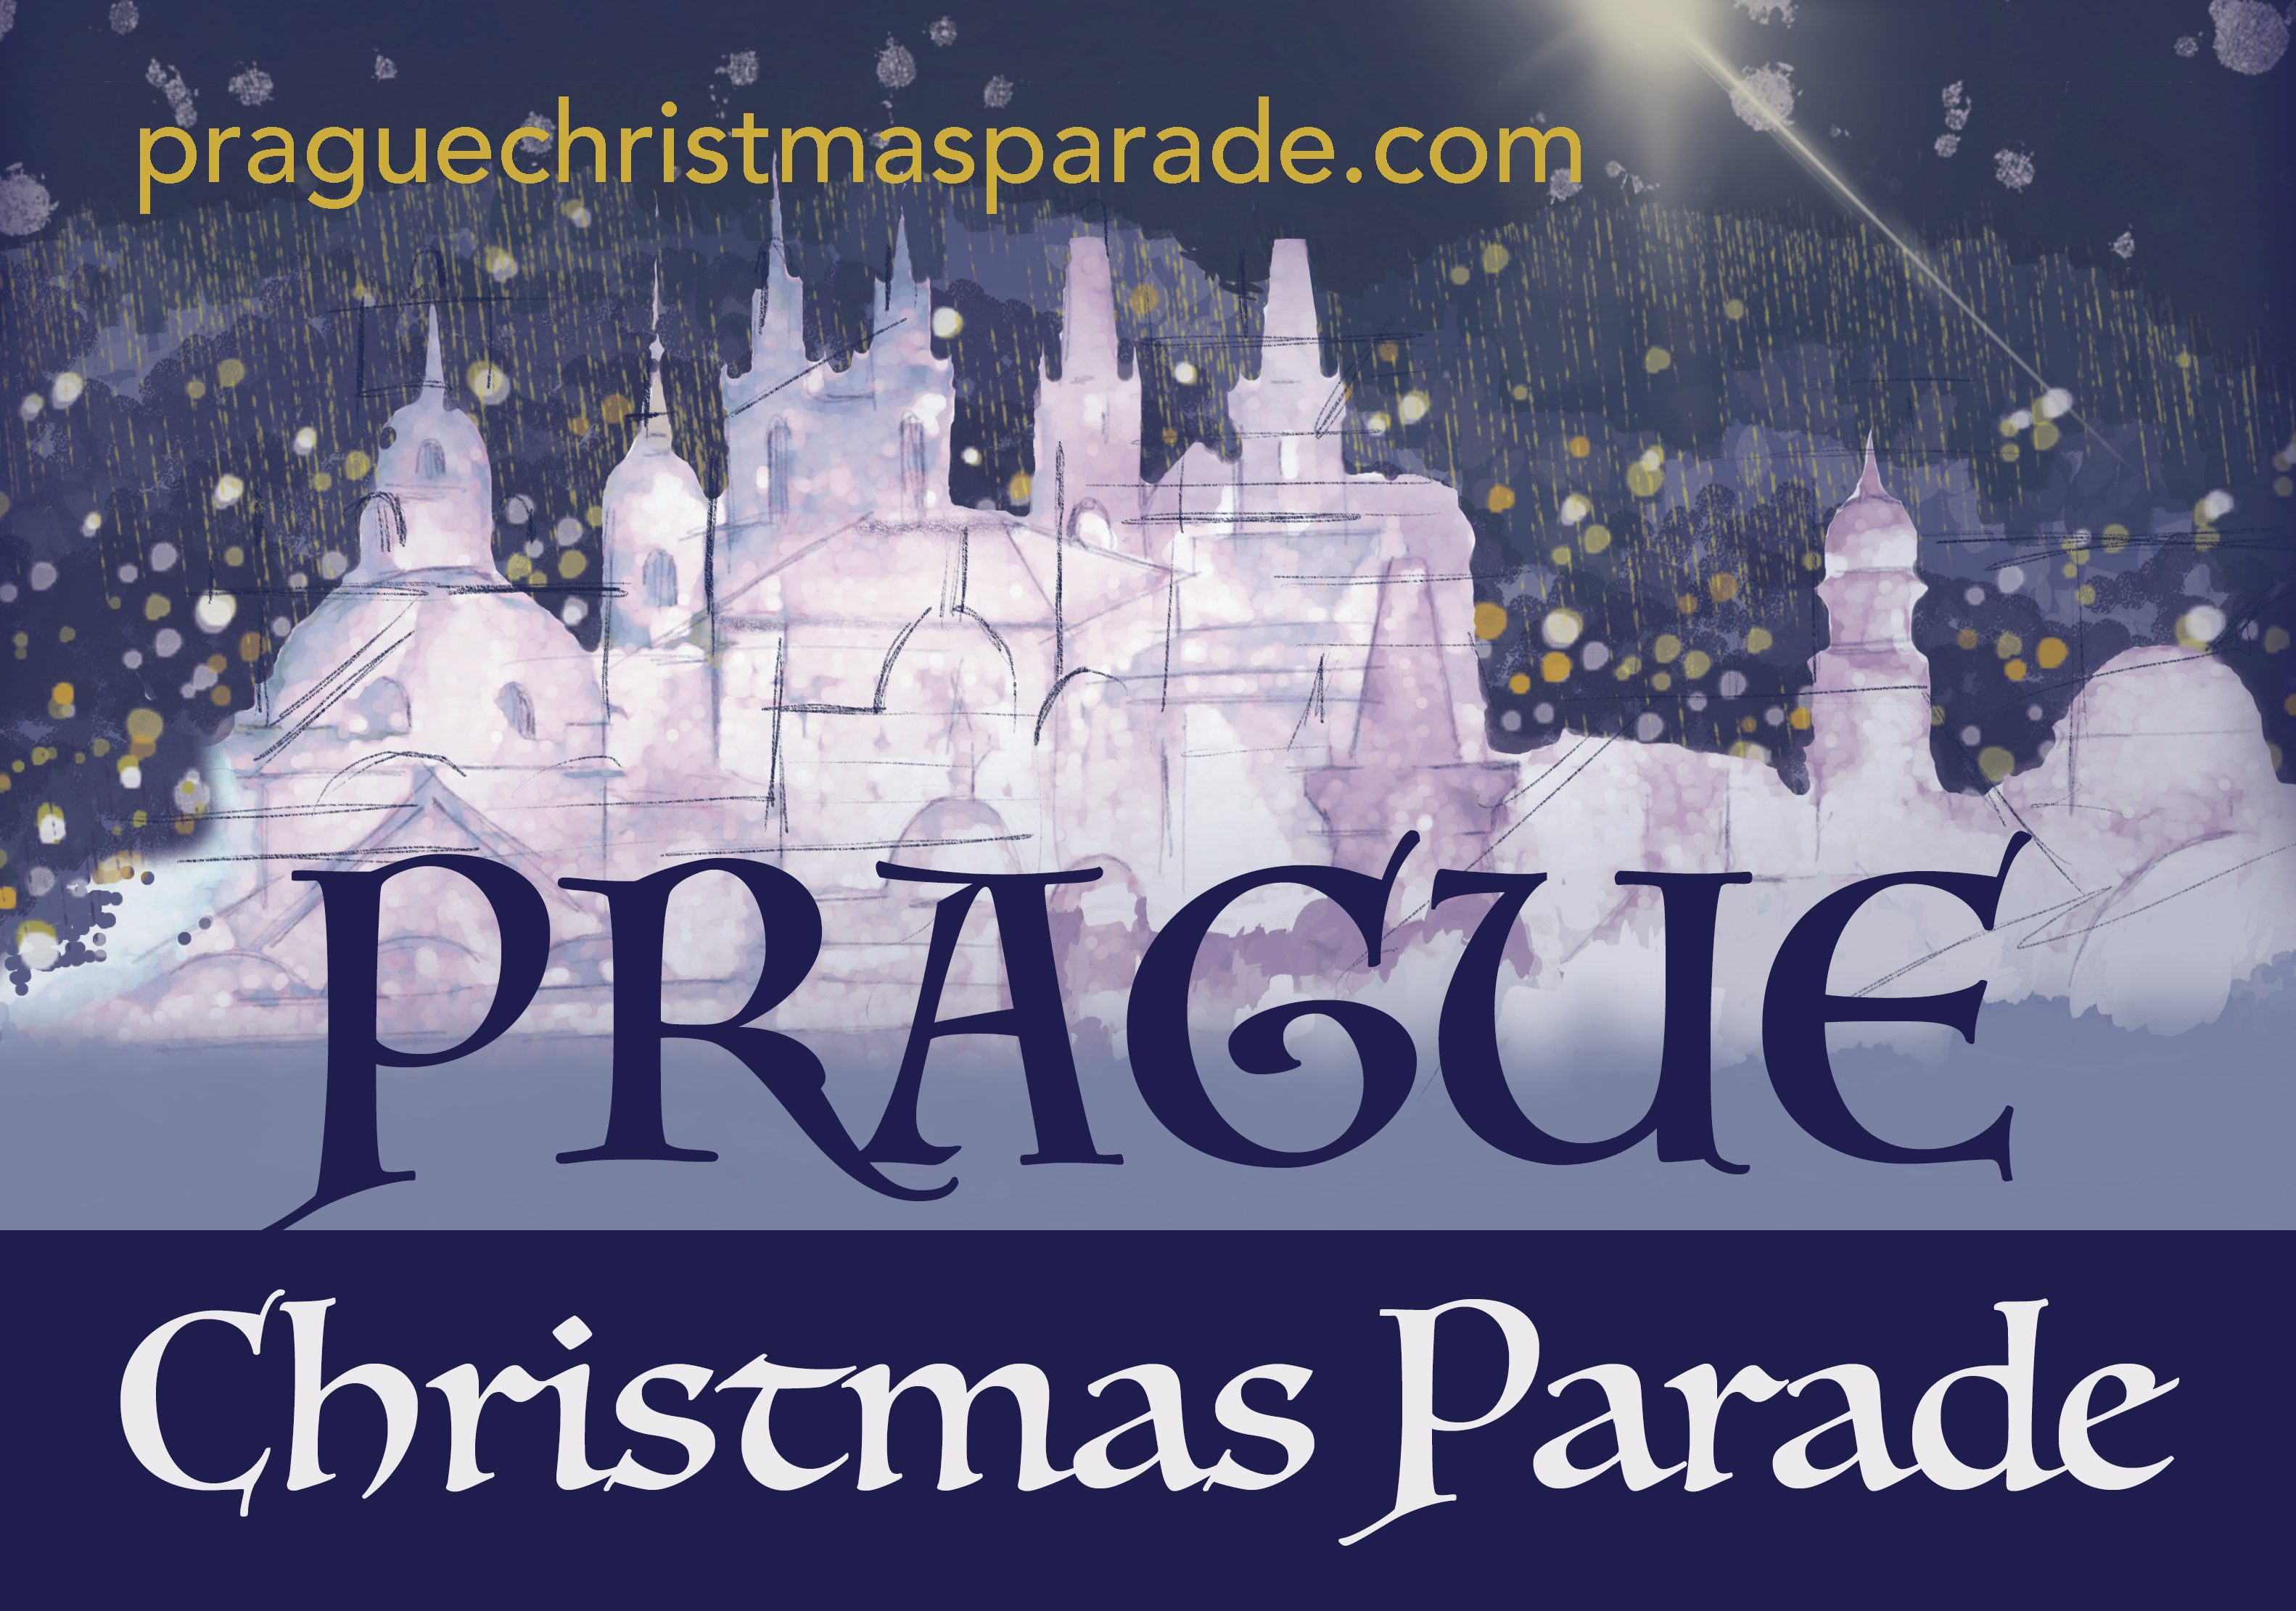 Gateway Prague – Parades Lower Ads Col3